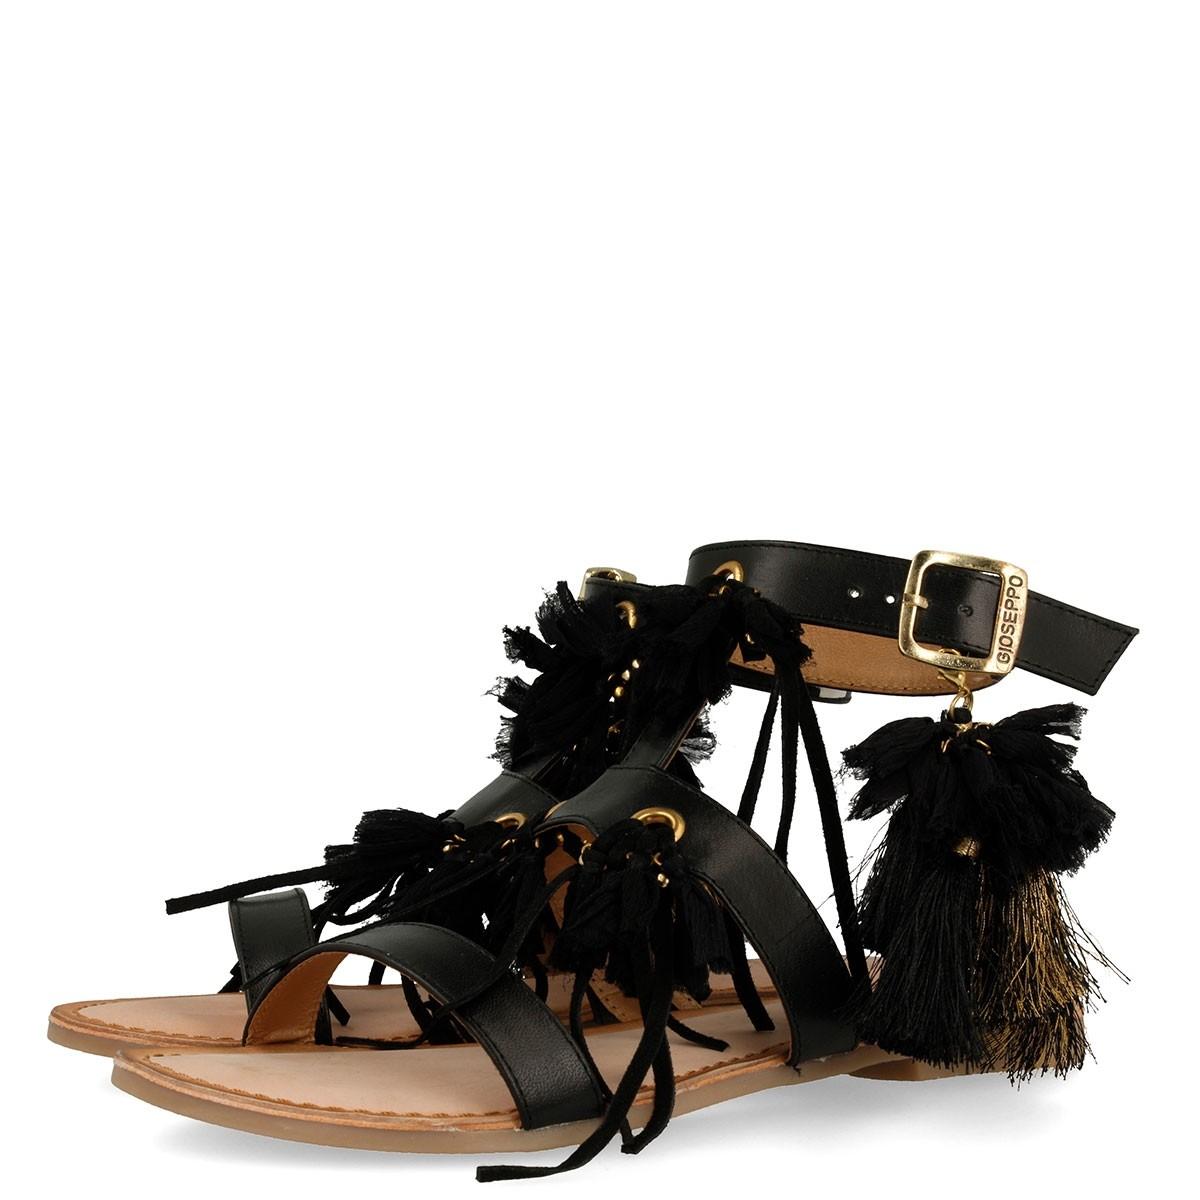 Chollaco en sandalias de piel